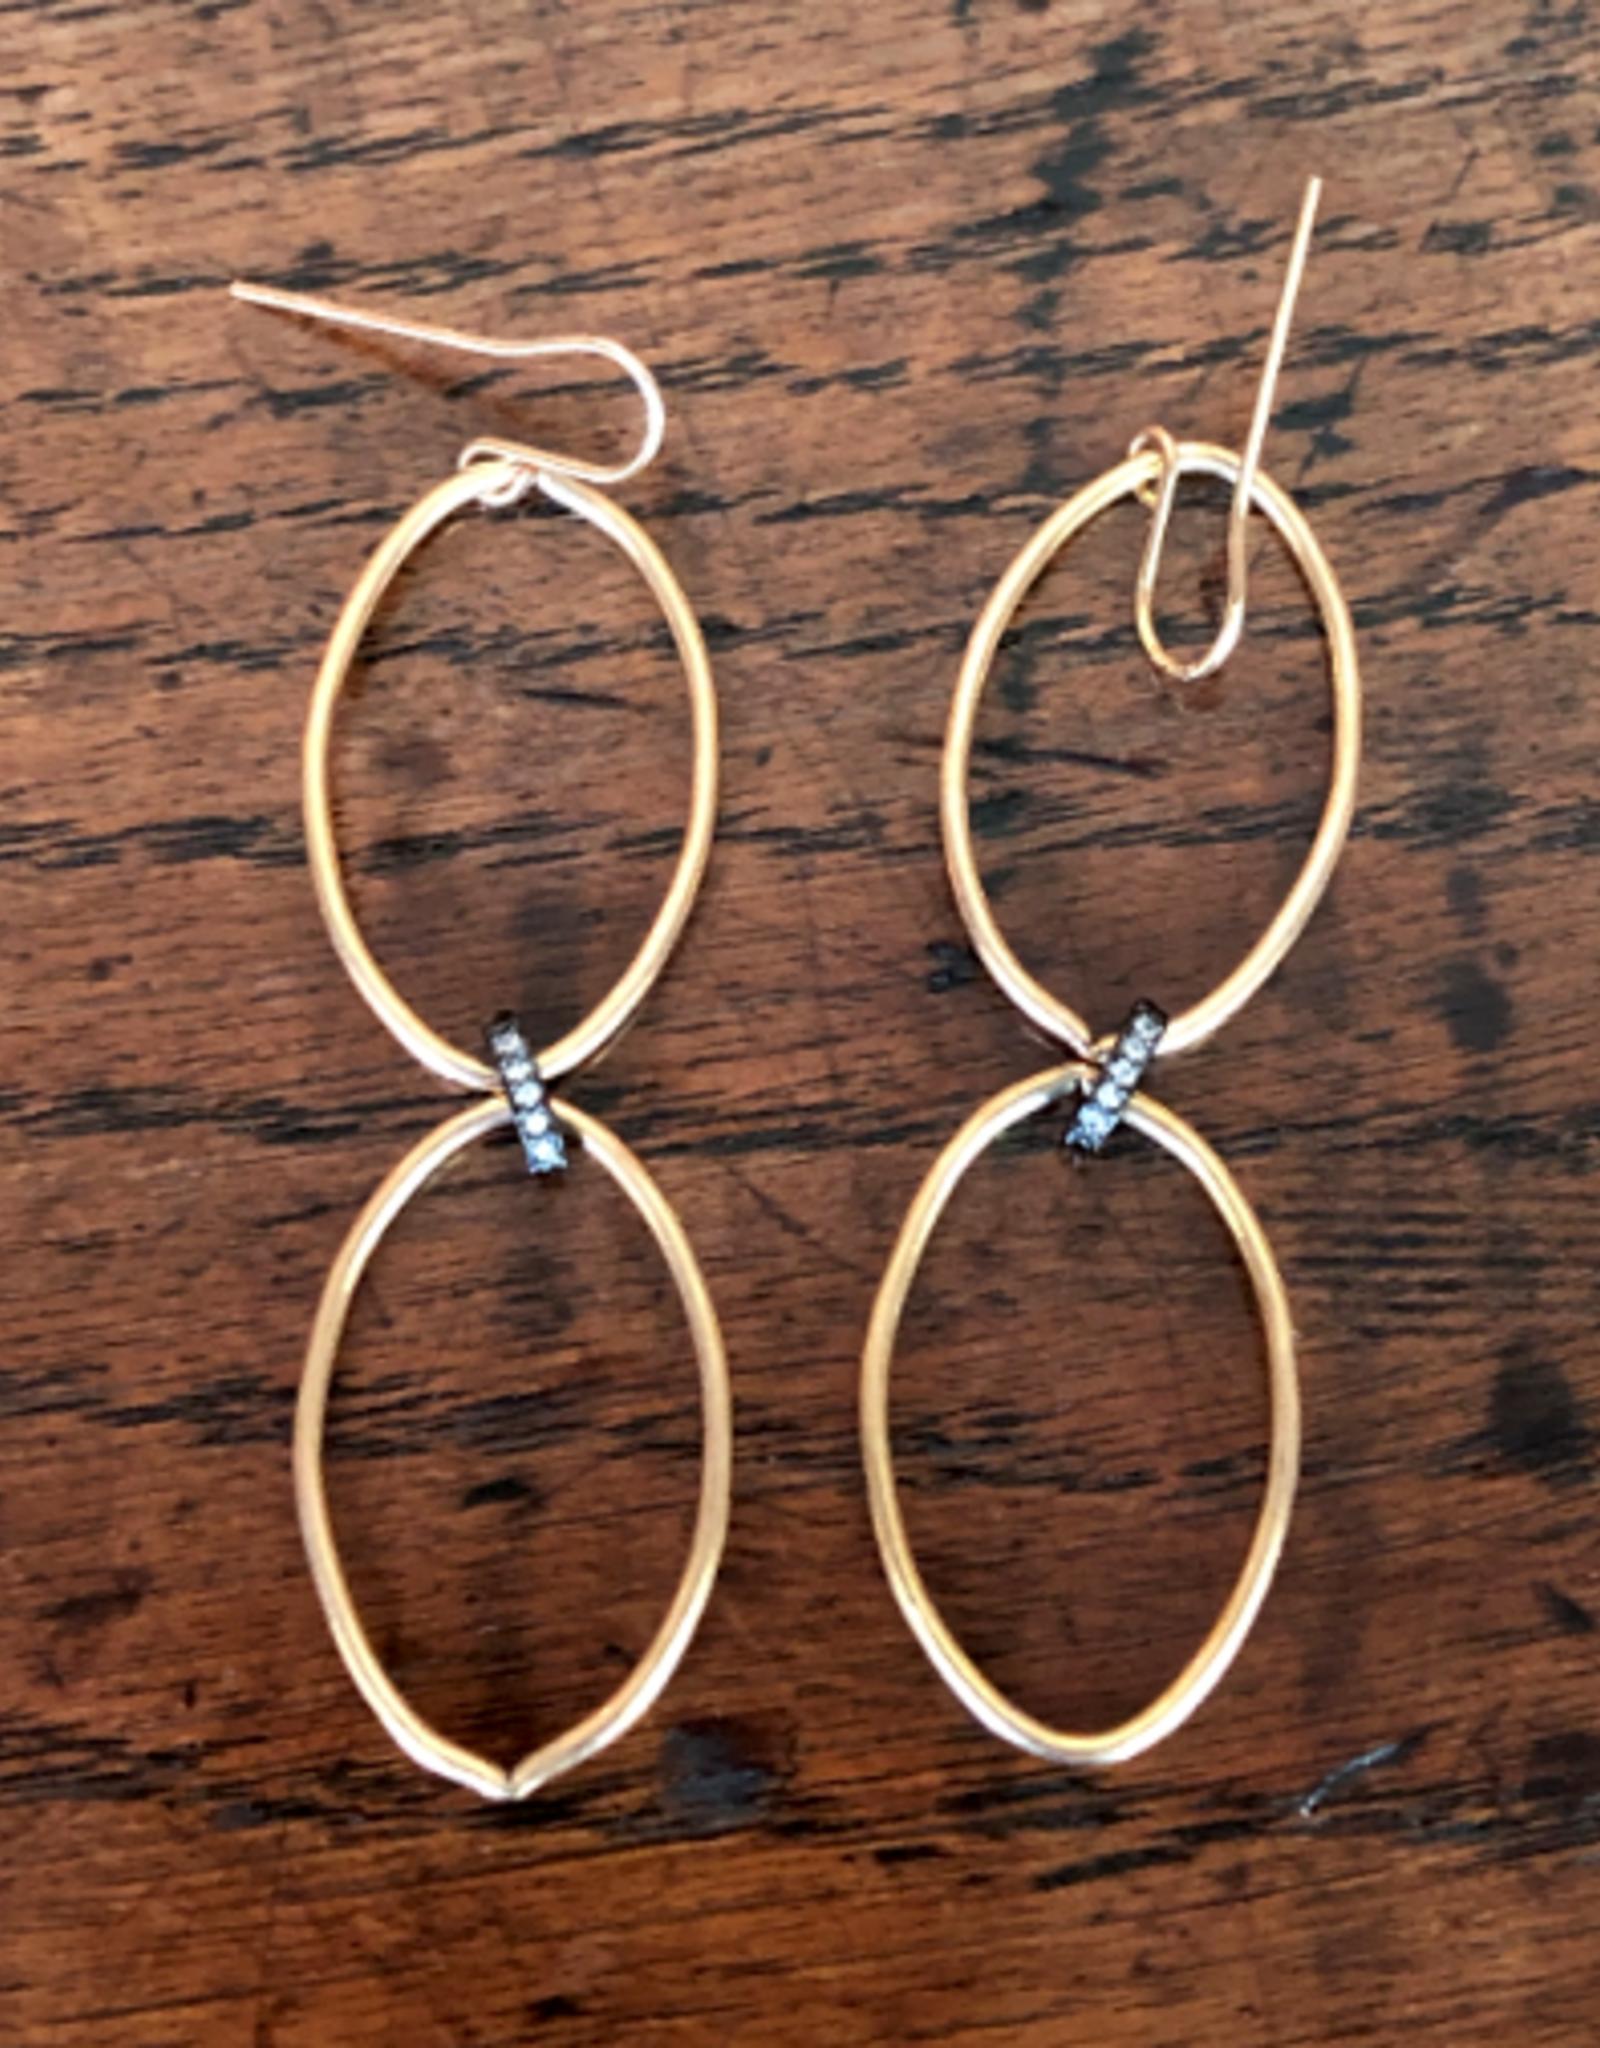 LOUISE ABROMS - Double Oval Earrings